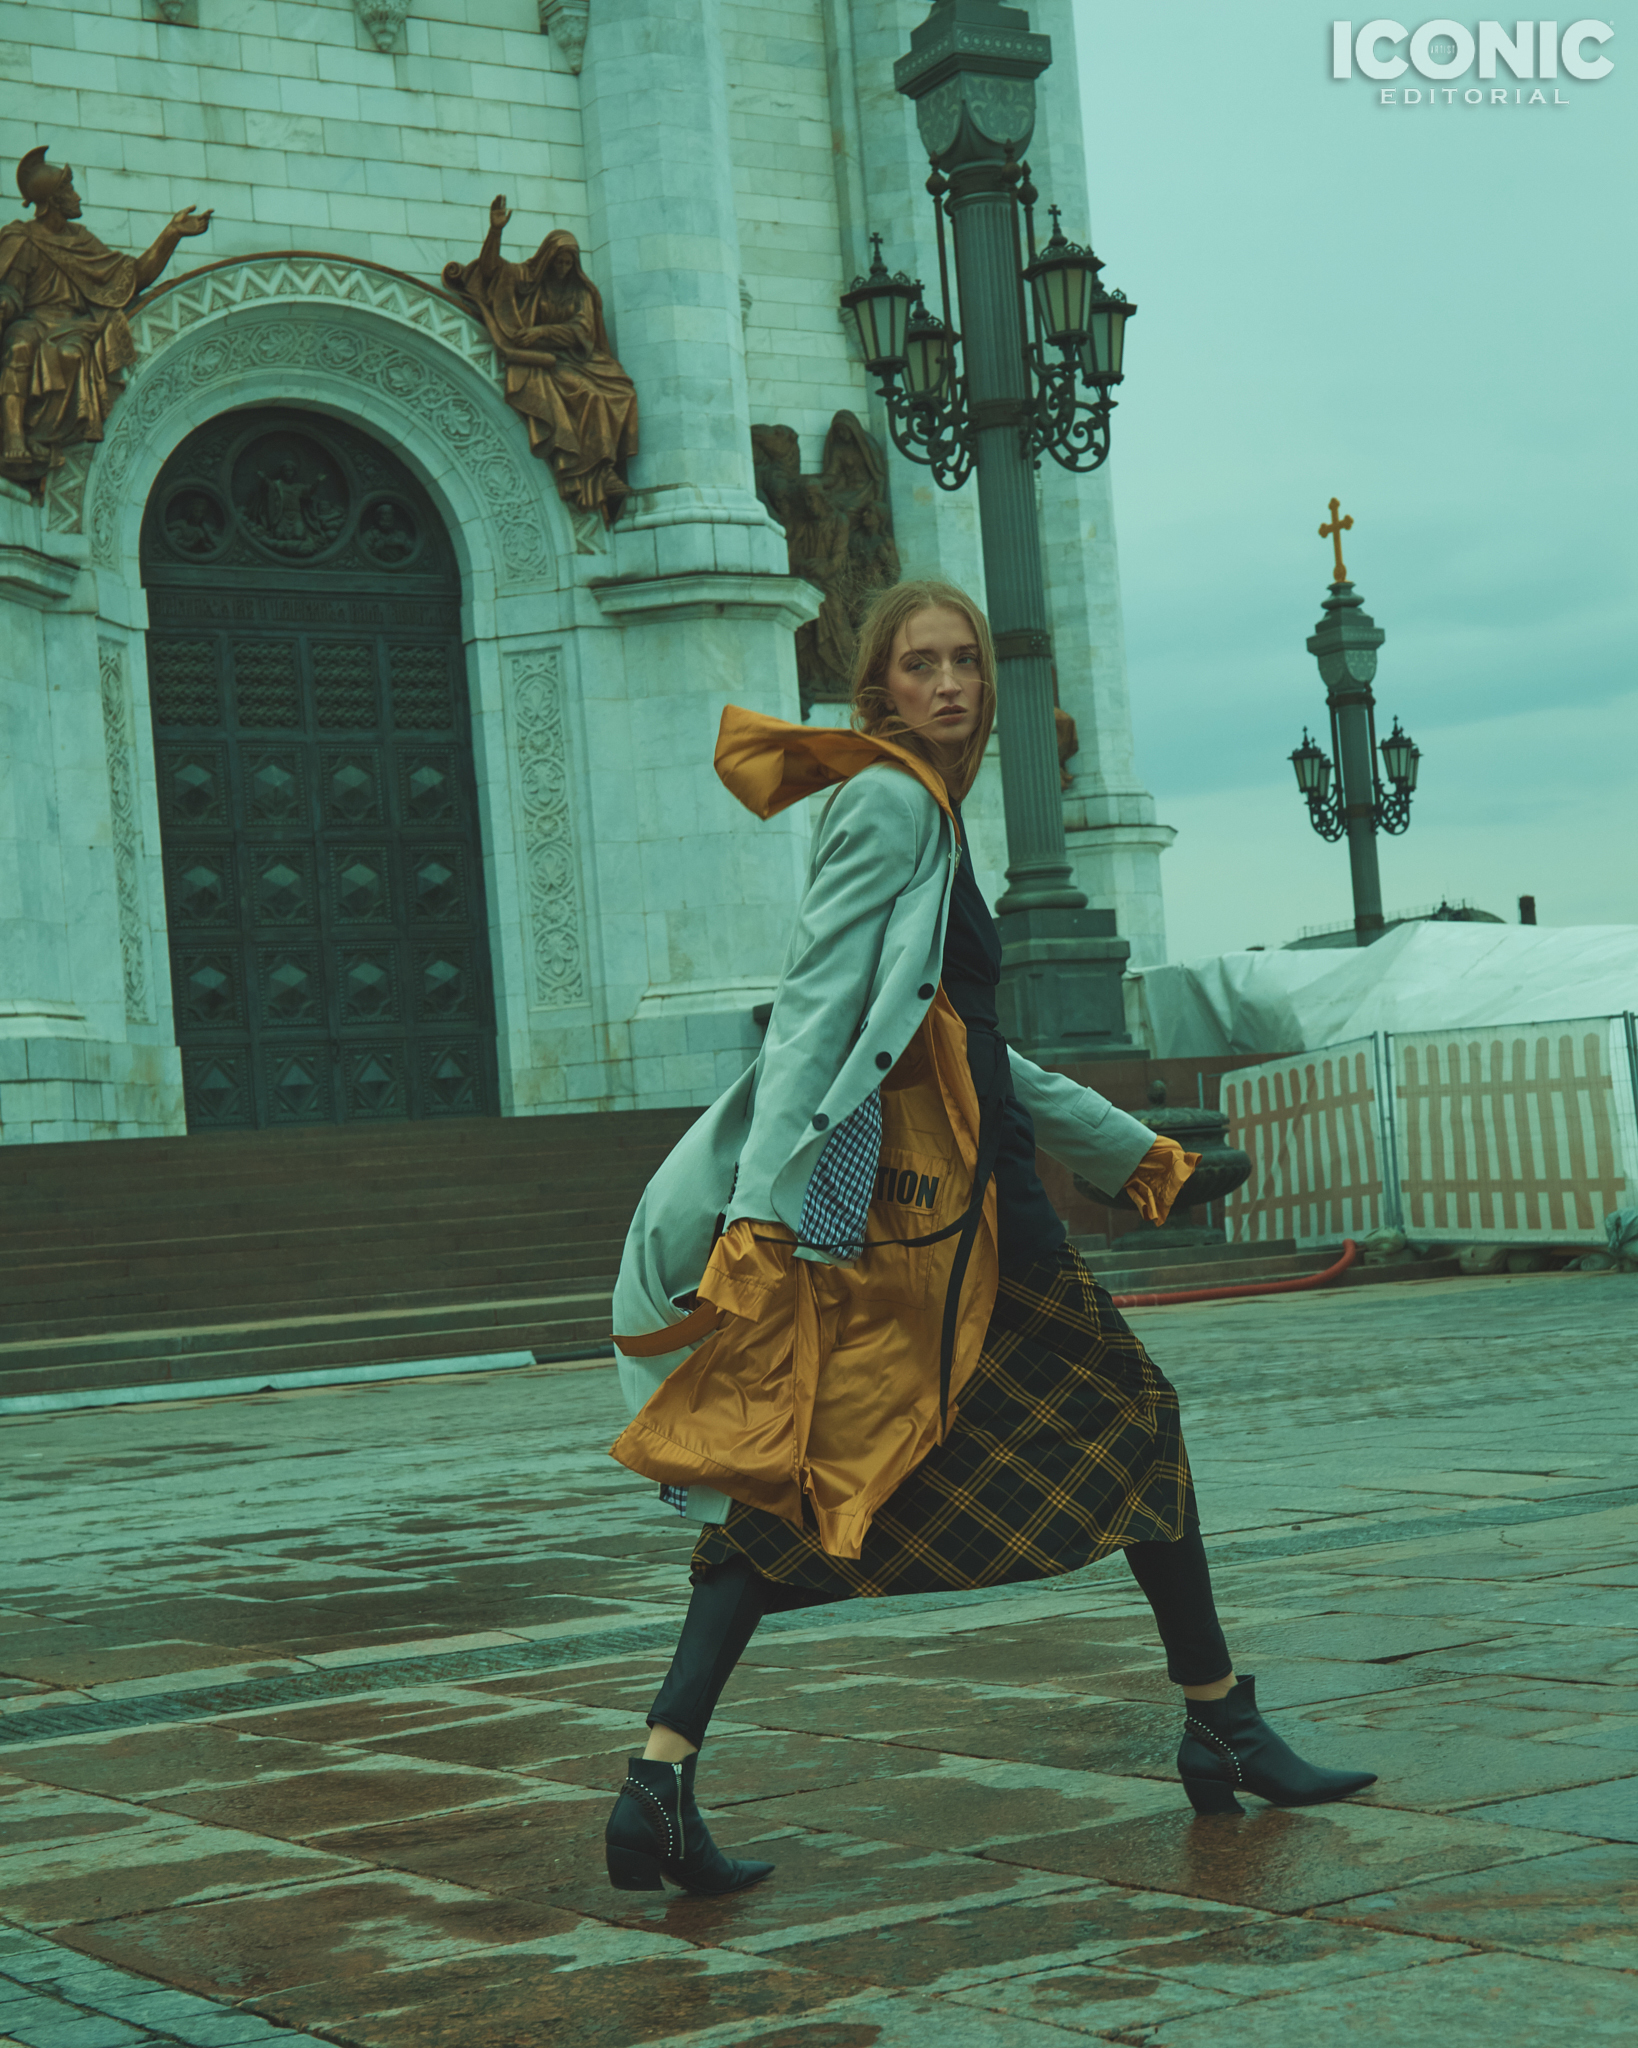 15/15  Jacket |  @artemshumov  Sweater |  @pingpongclubmoscow  Cape |  @crimescene_official  Dress |  @lenamaksimova.brand  Leggins |  @calzedonia  Boots |  @rosbalet   © Alej Fernández